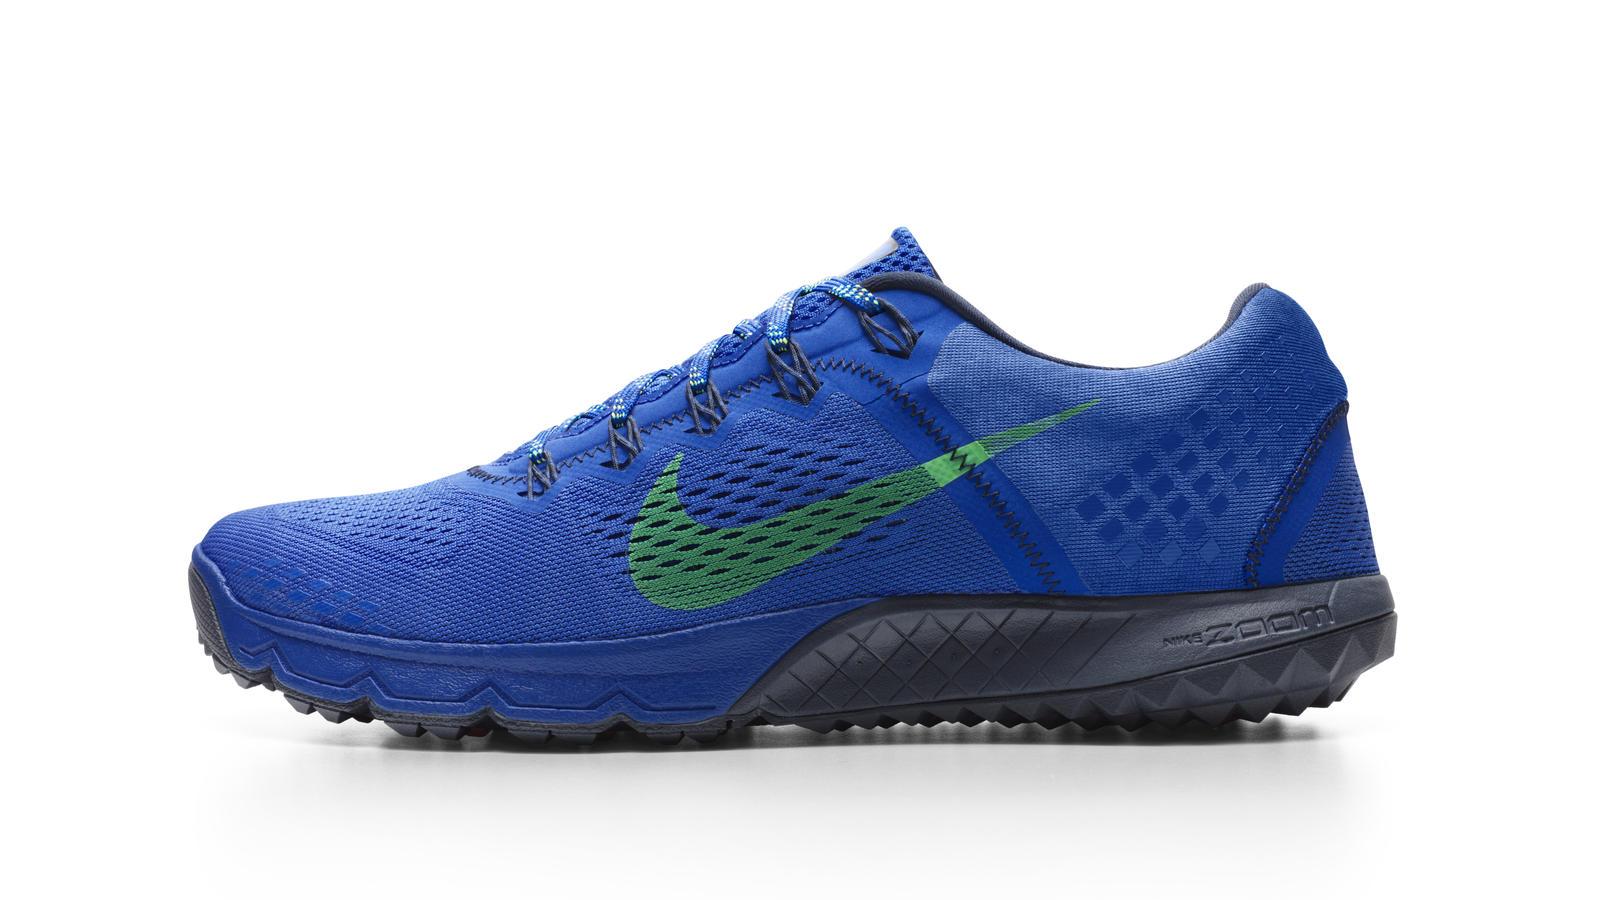 Nike Zoom Terra Kiger M Profile